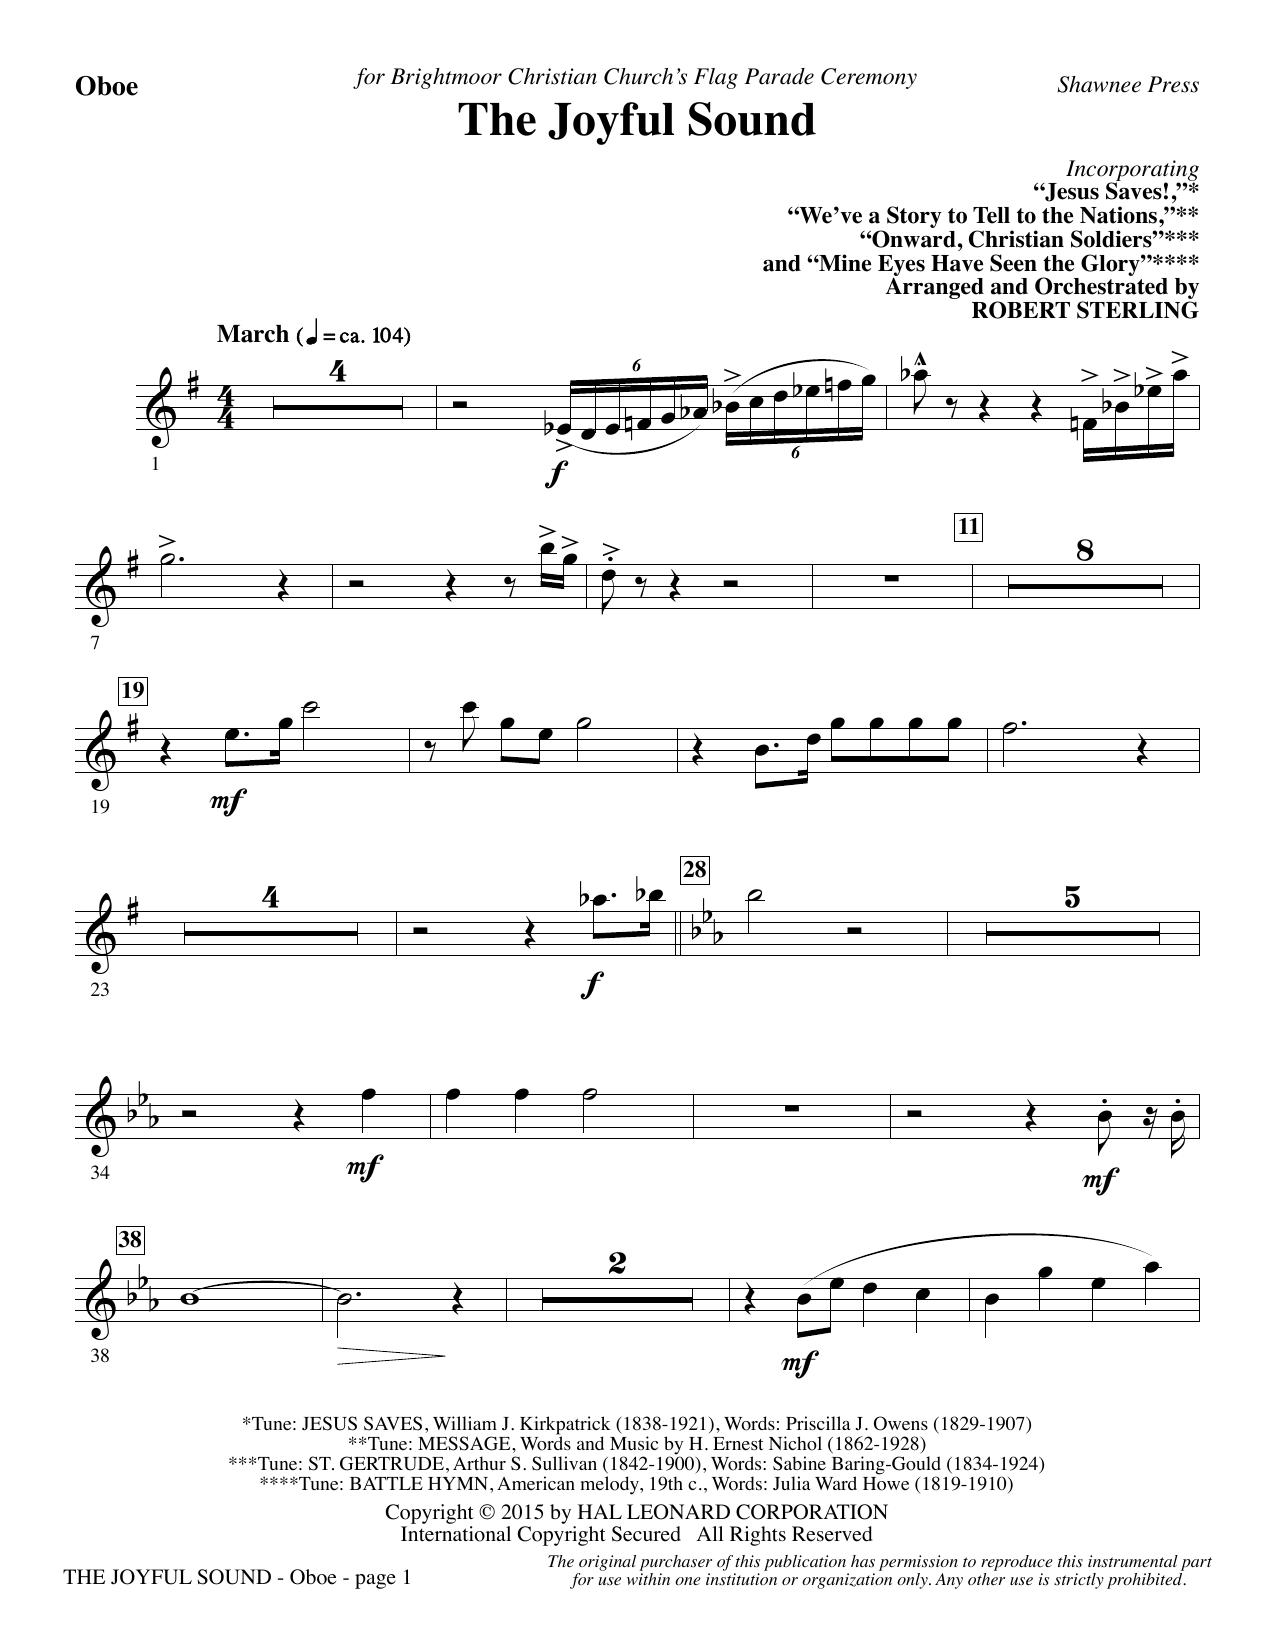 The Joyful Sound - Oboe Sheet Music